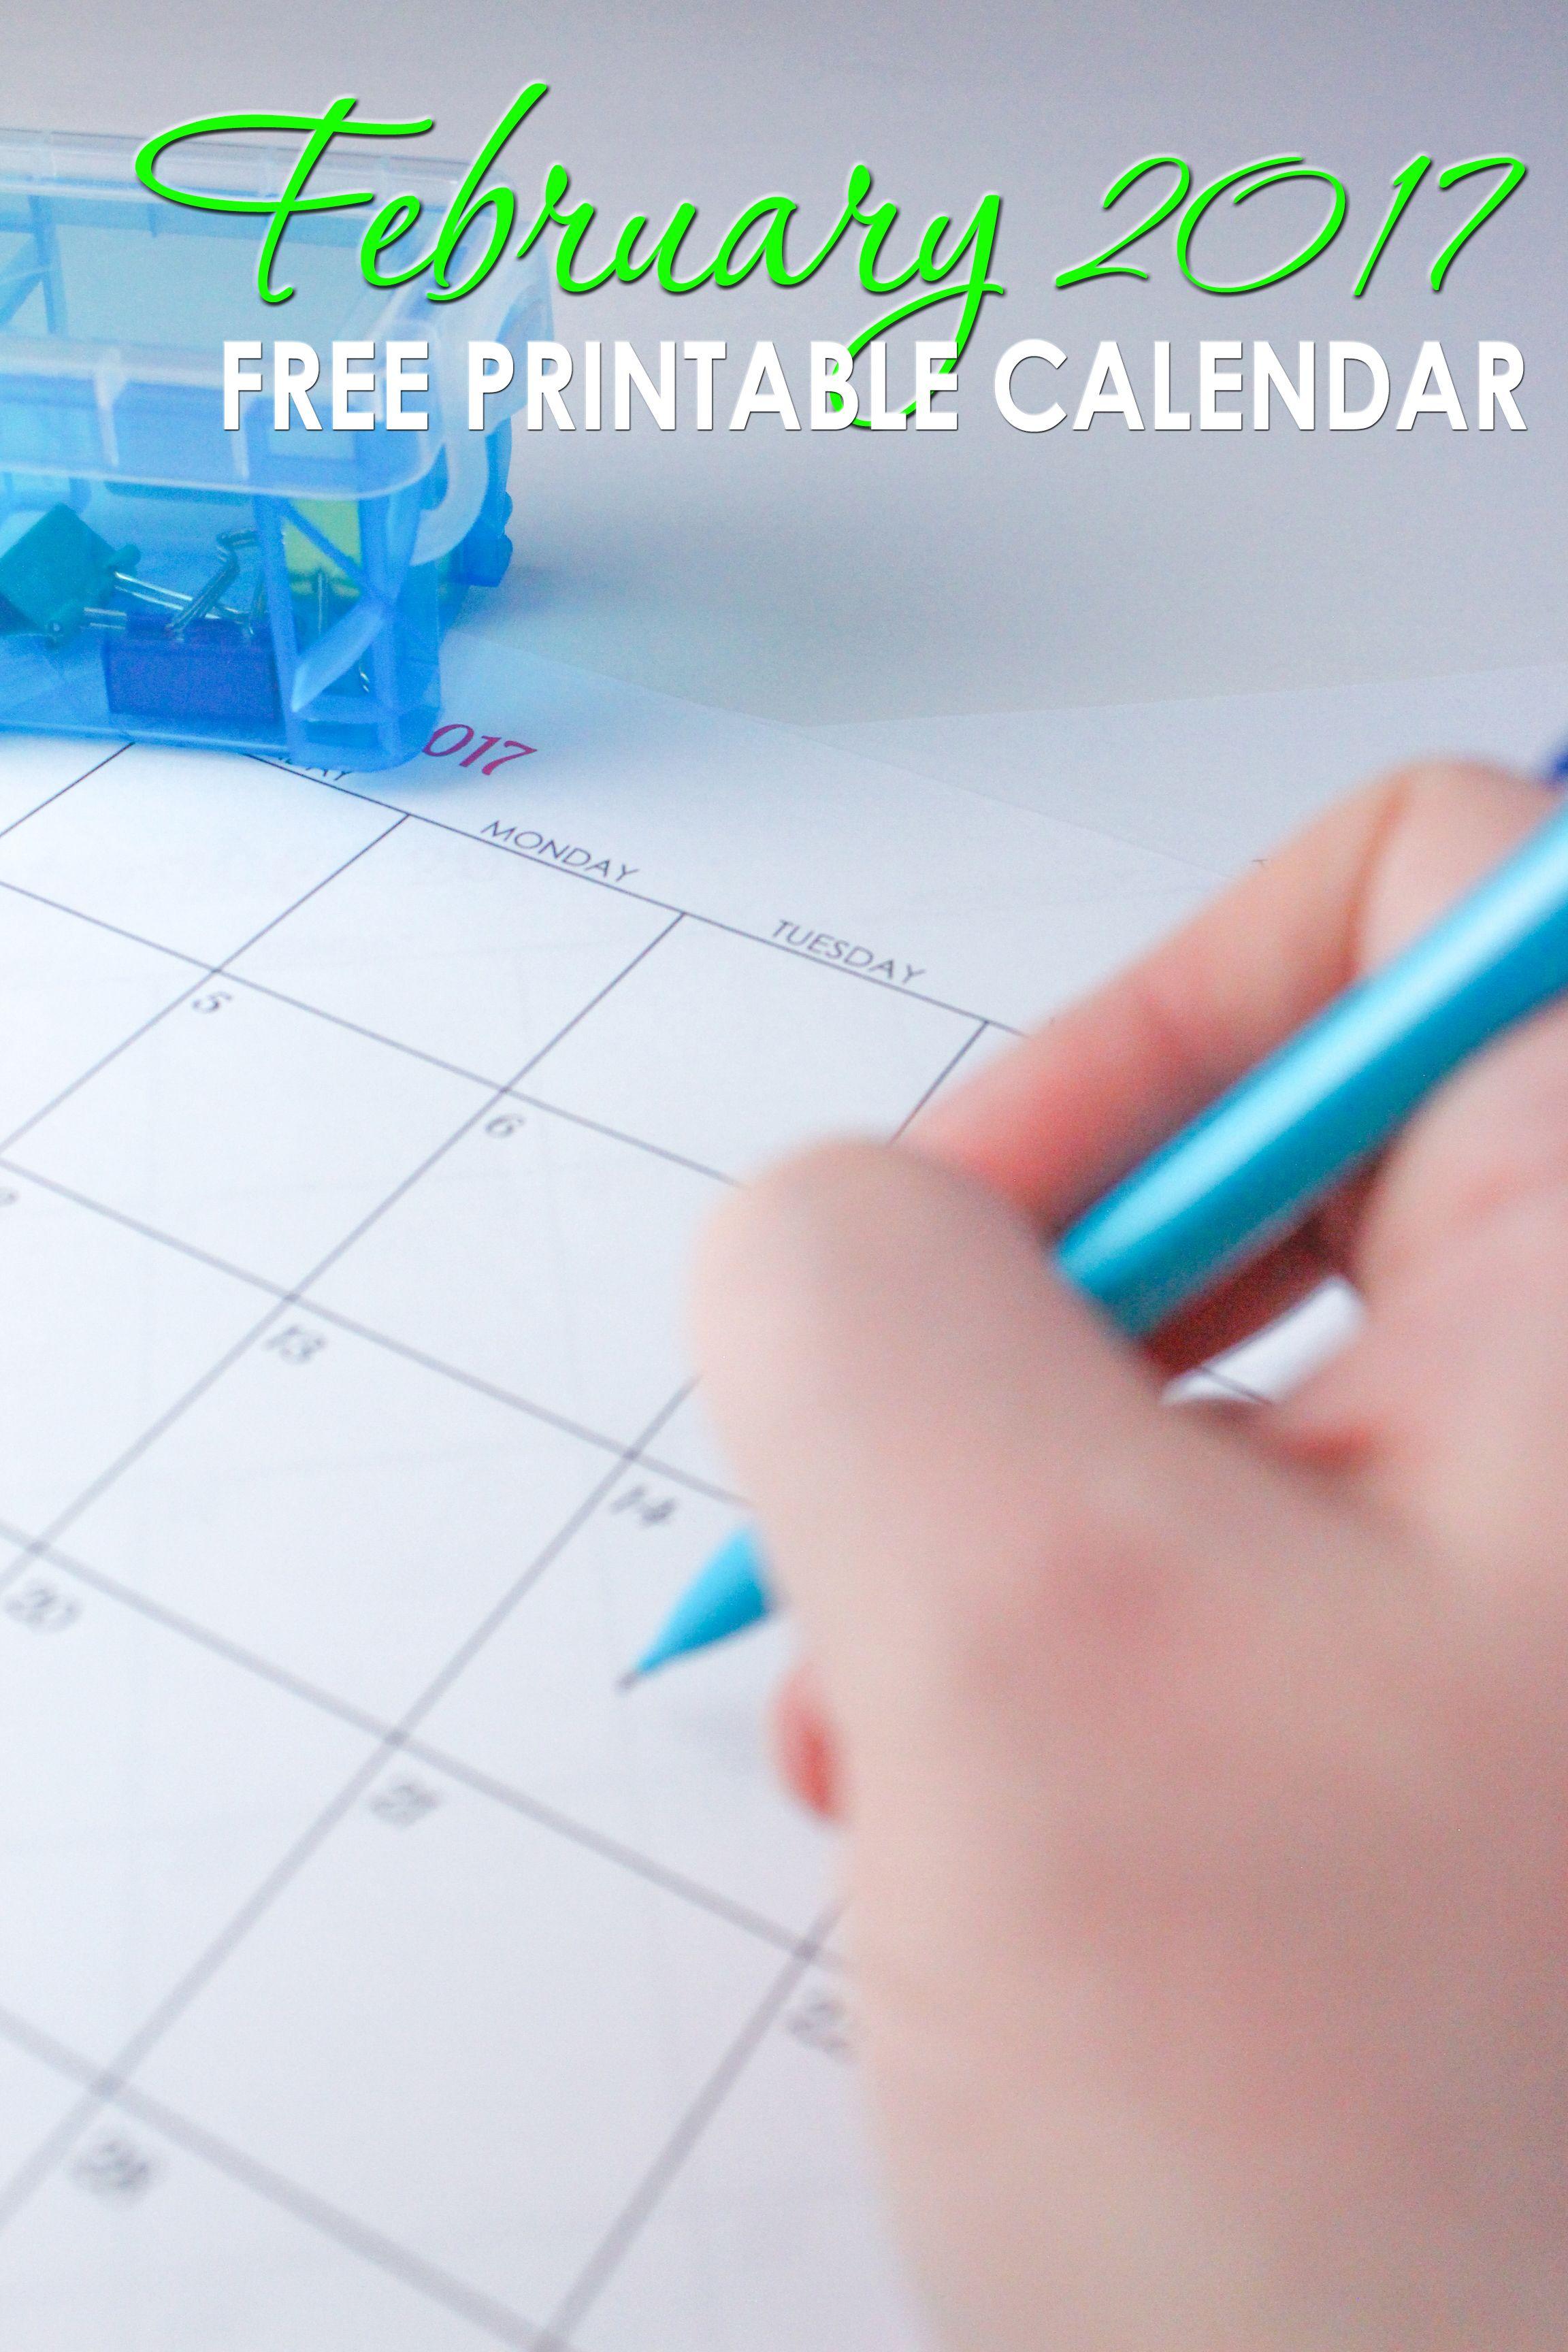 Free Blank Online Calendar February 2017 | Your life, Organize ...